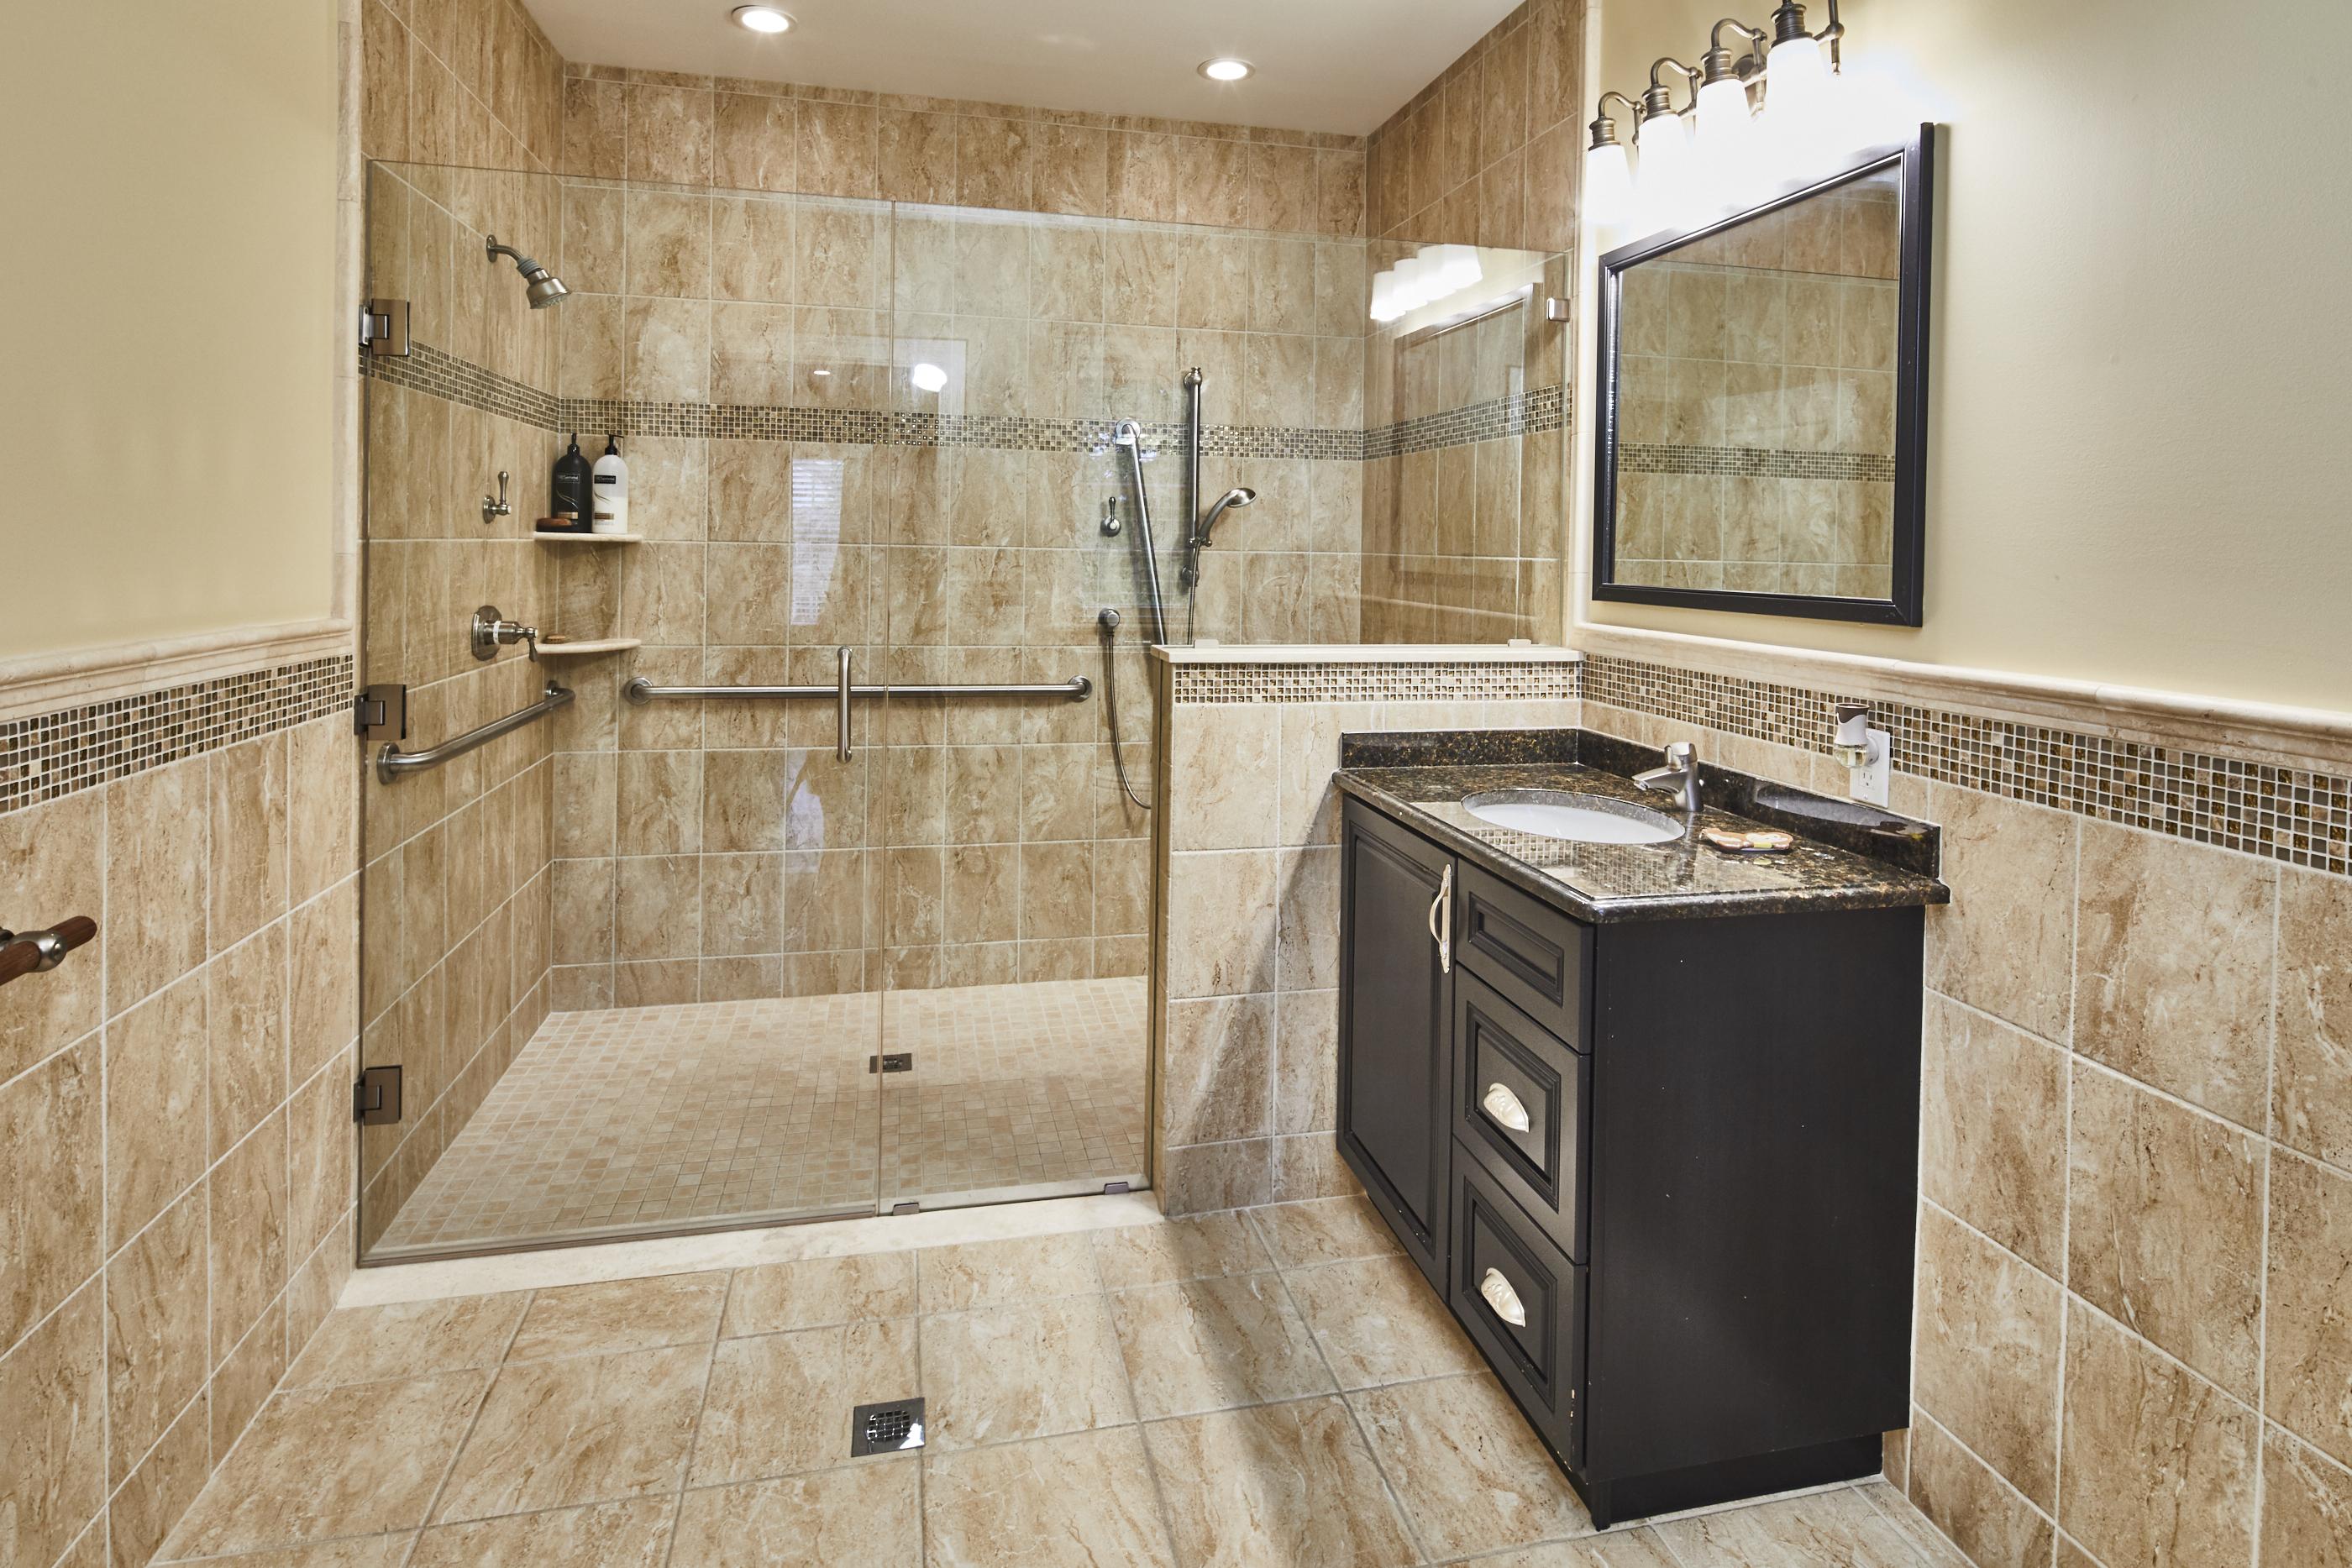 Ada Compliant Bathroom Long Foster Long Foster Newsroom